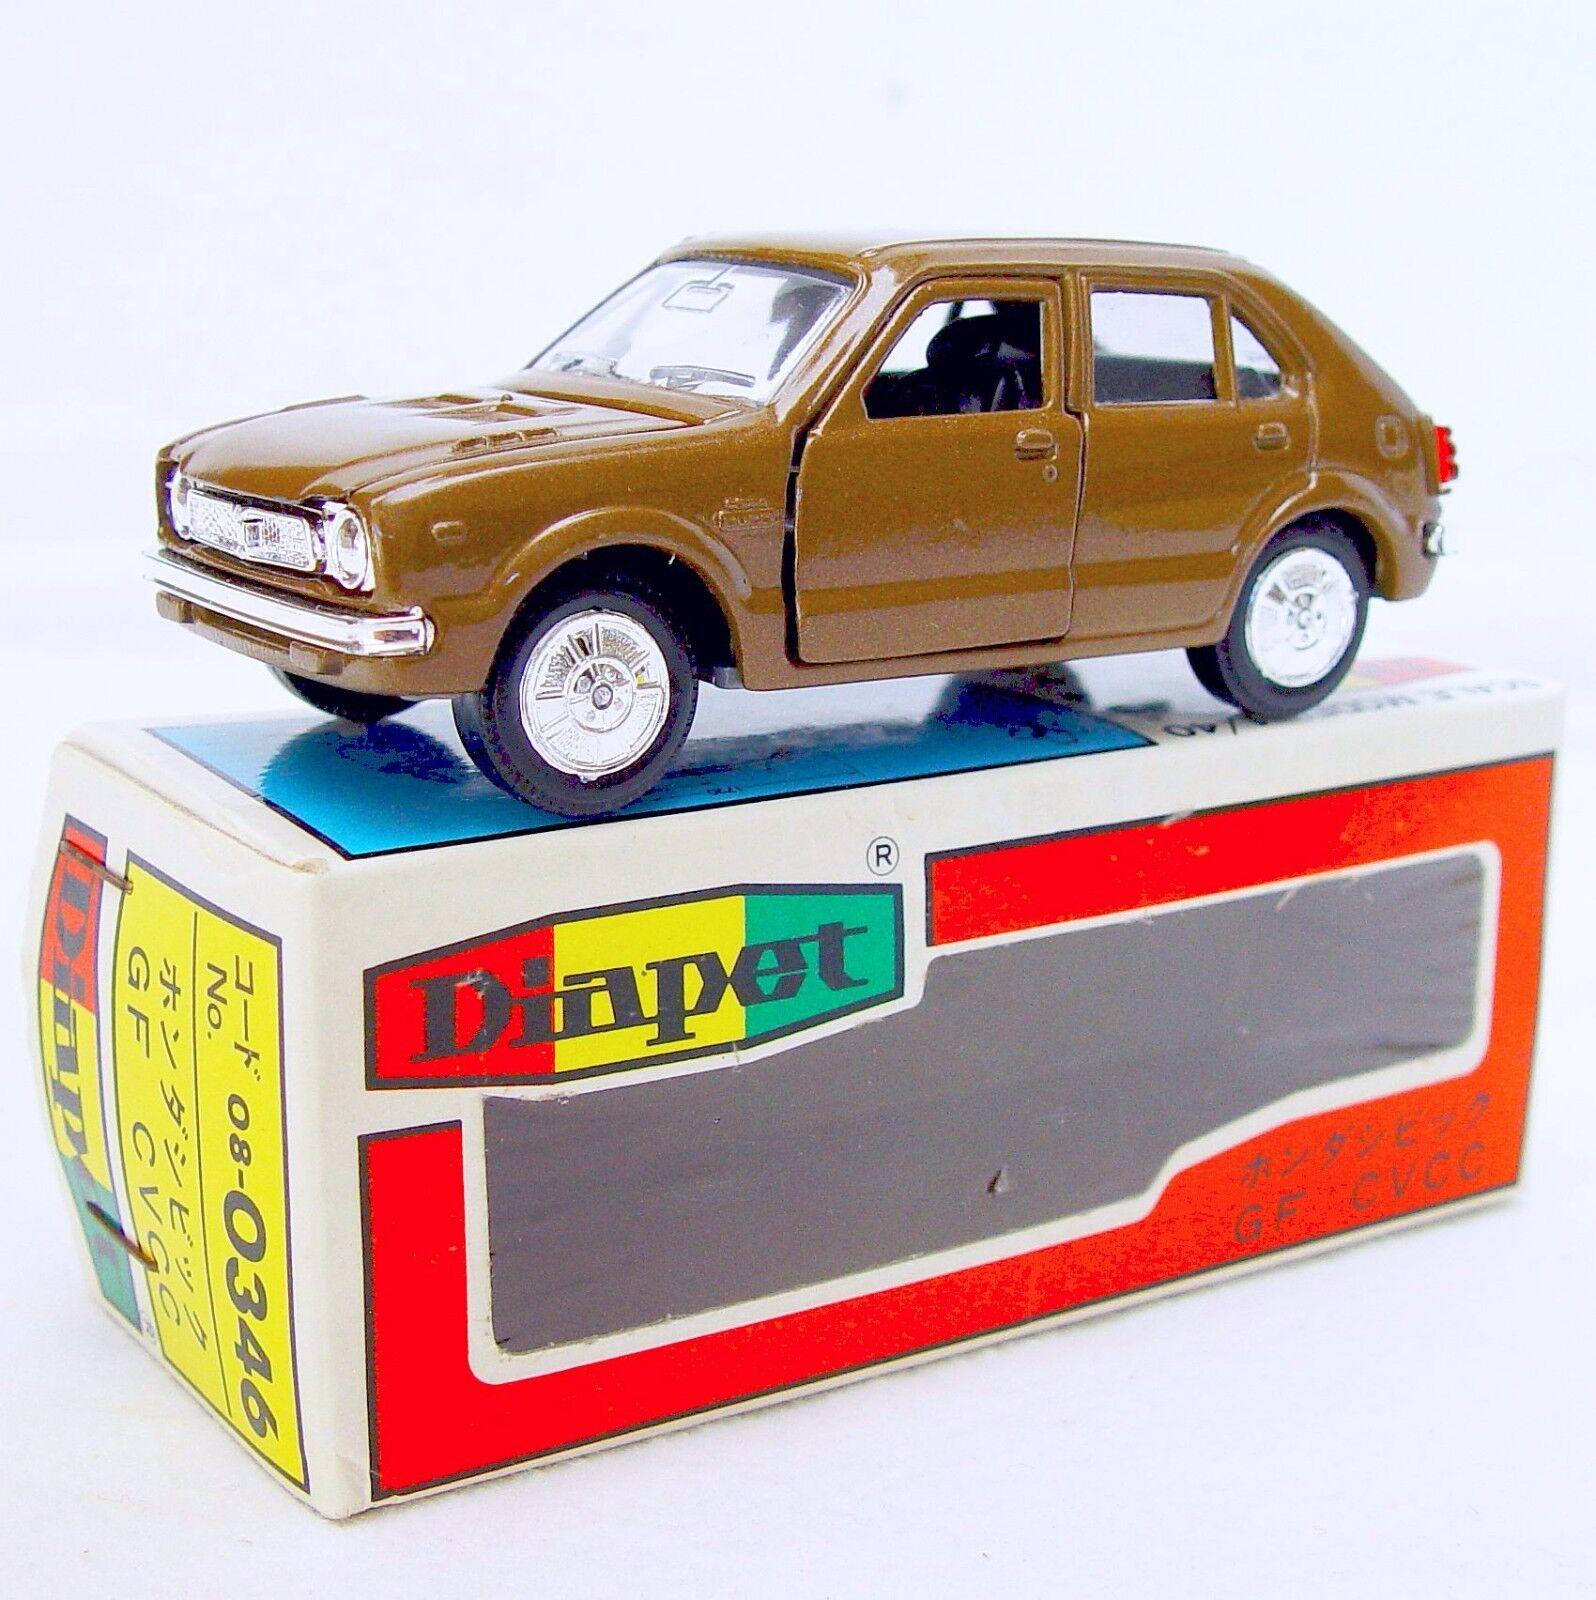 DIAPET Japón 1 43 Honda Civic CVCC GF 4 puertas coche modelo MIB`78  Bronze artículo raro